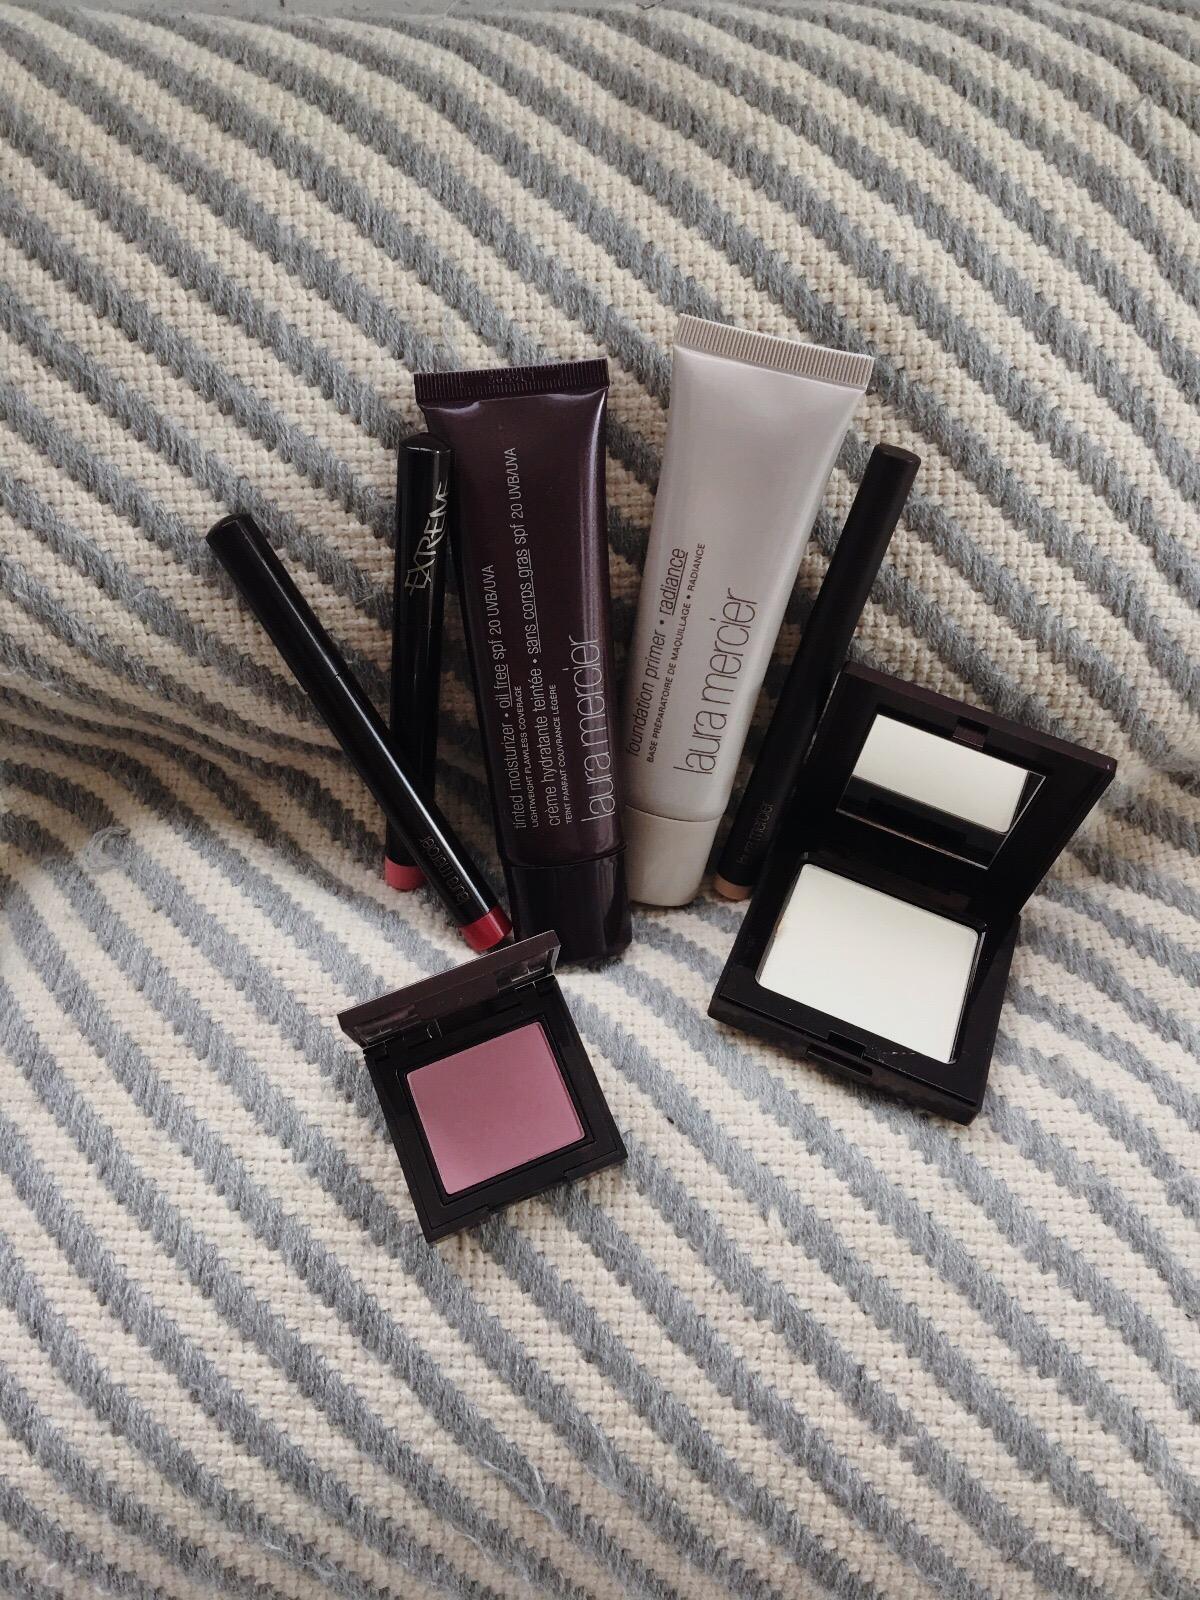 jasminehardingmakeup - laura mercier makeup review